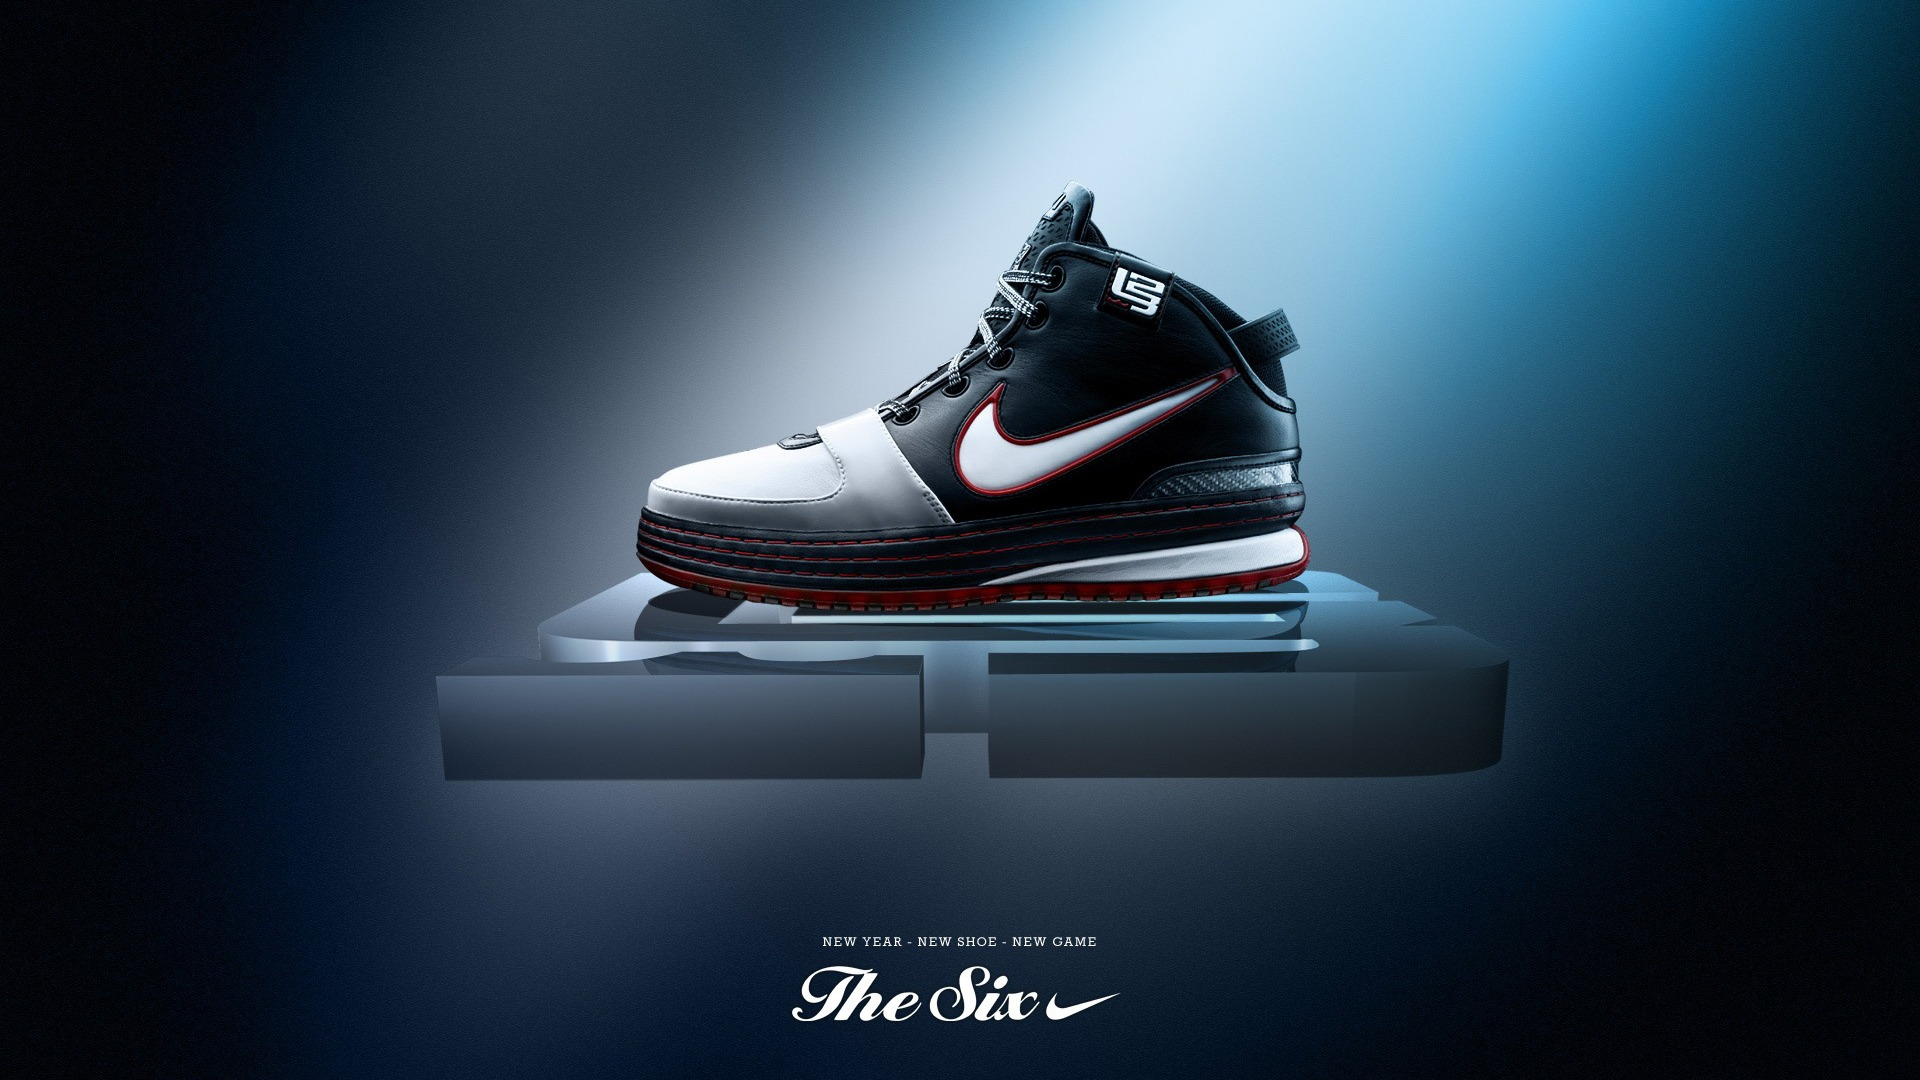 Kevin Durant Wallpaper Hd Nike